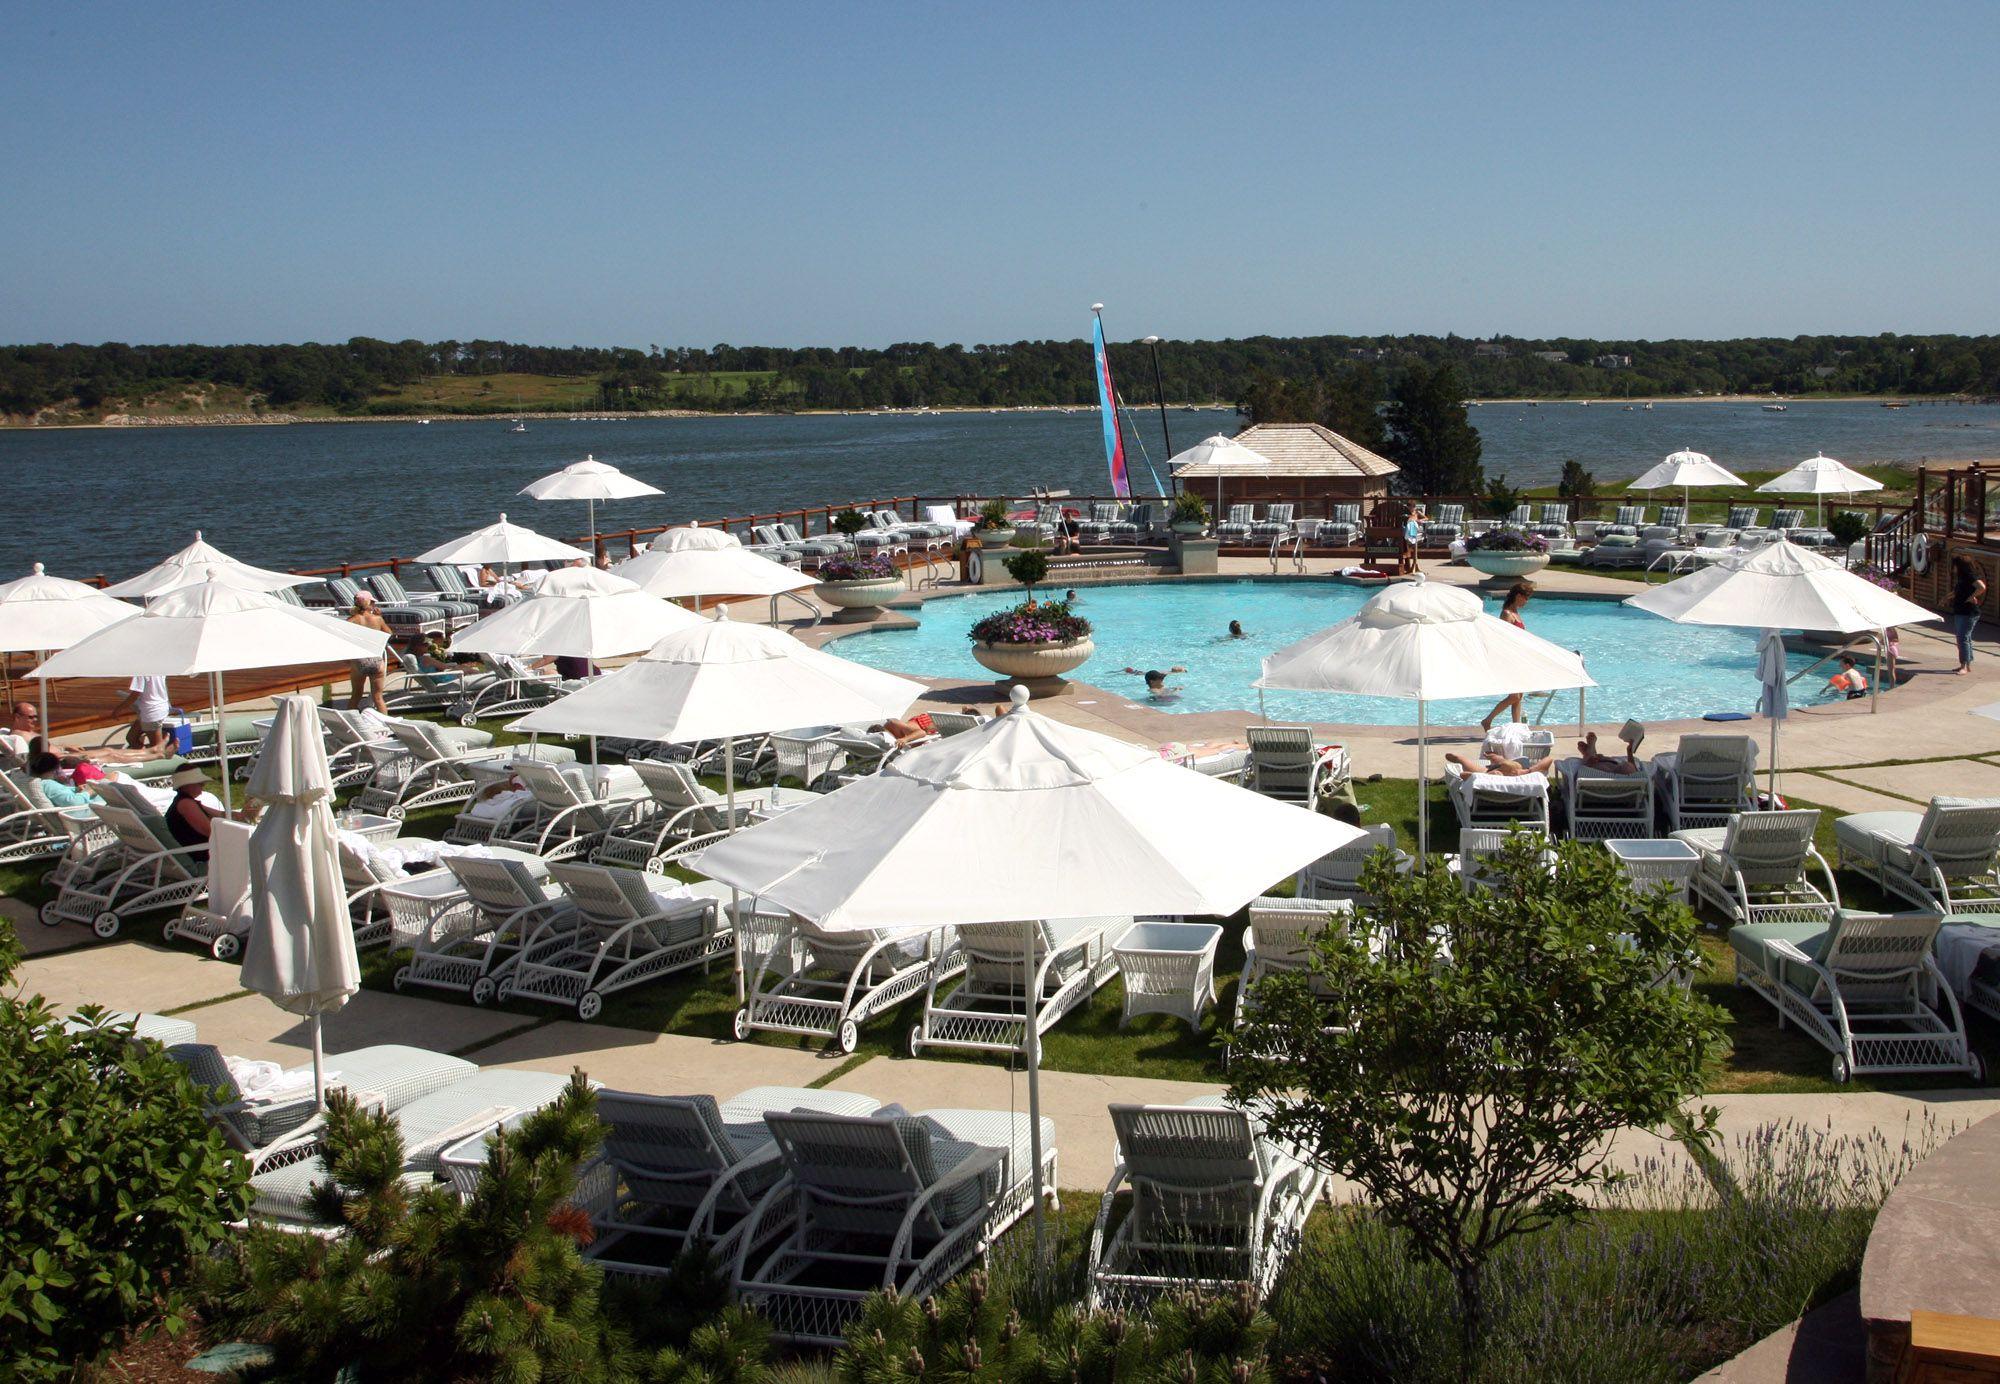 Cape Cod Hotels >> Best Beachfront Hotels On Cape Cod According To Tripadvisor